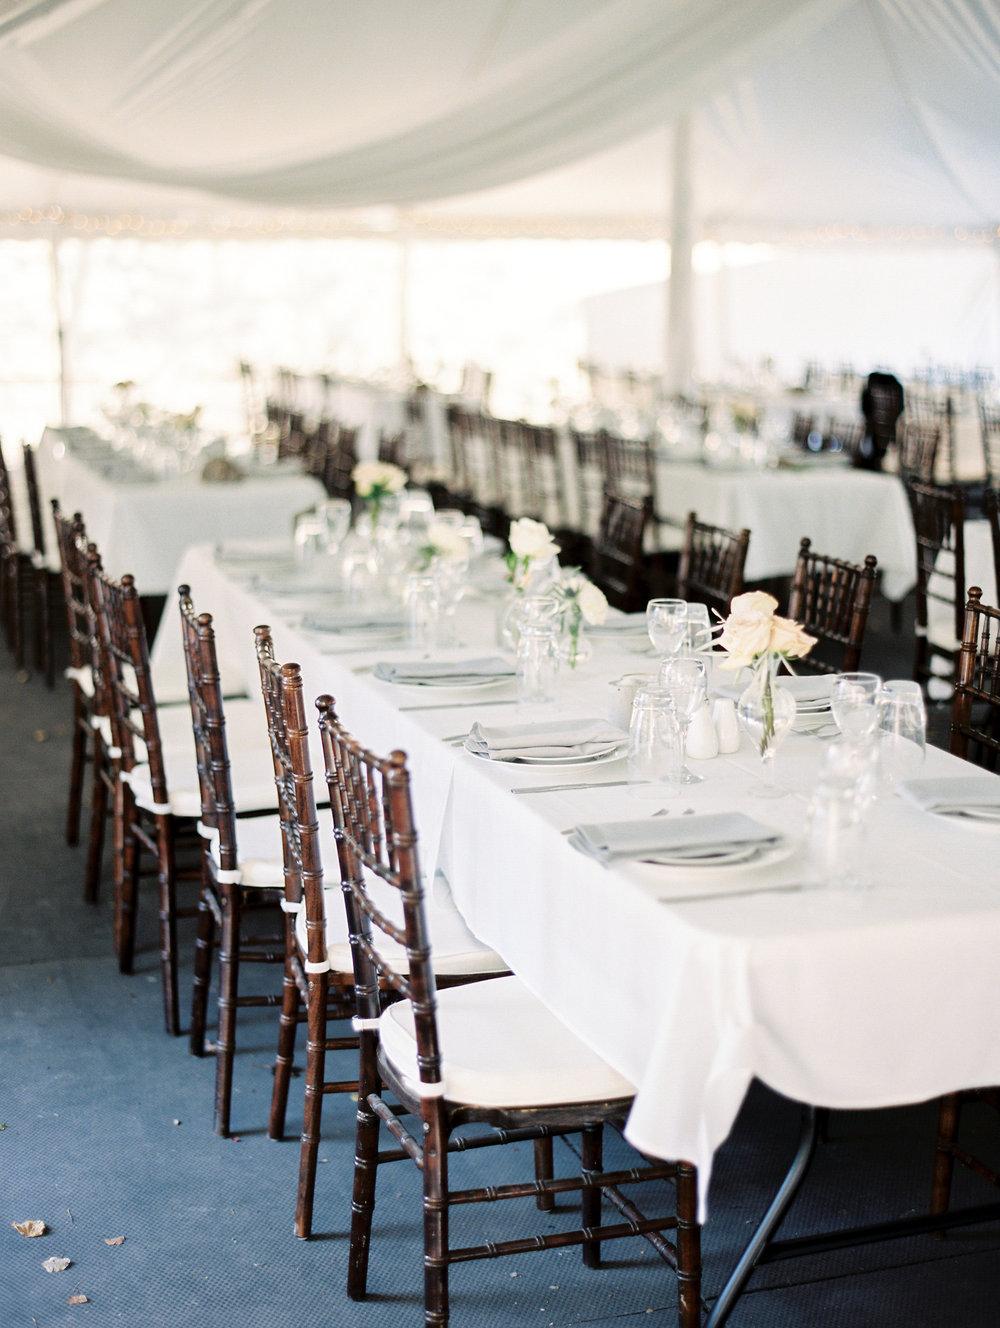 Tent Wedding Decor Ideas - Winnipeg Wedding flowers